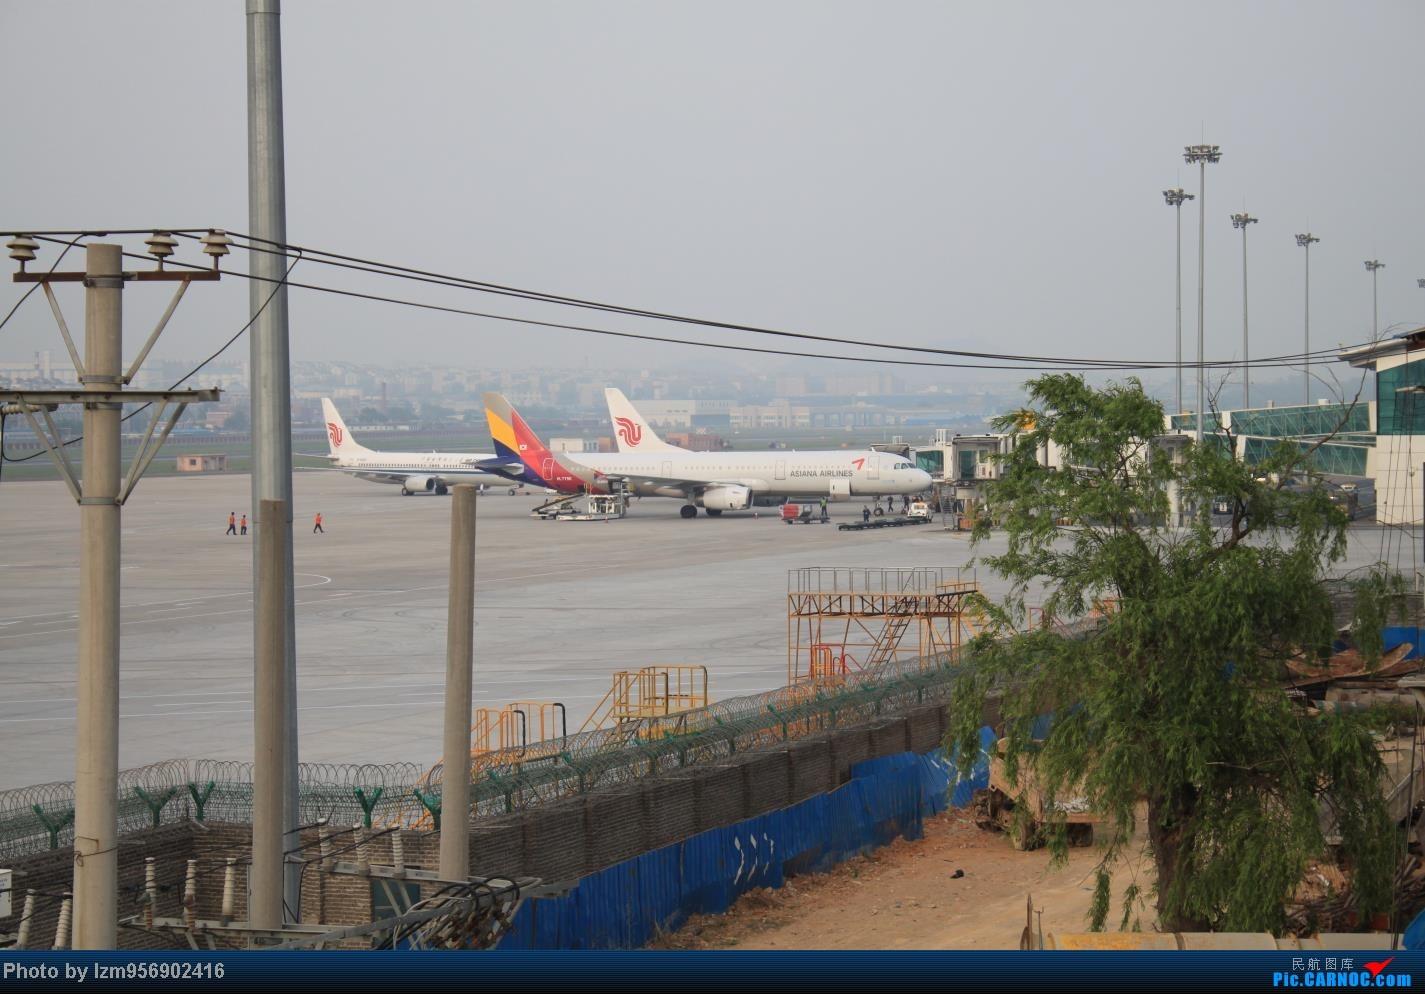 Re:[原创]DLC蹲点大半天,拍到了大棒航空772=w= AIRBUS A321 HL7790 中国大连周水子机场